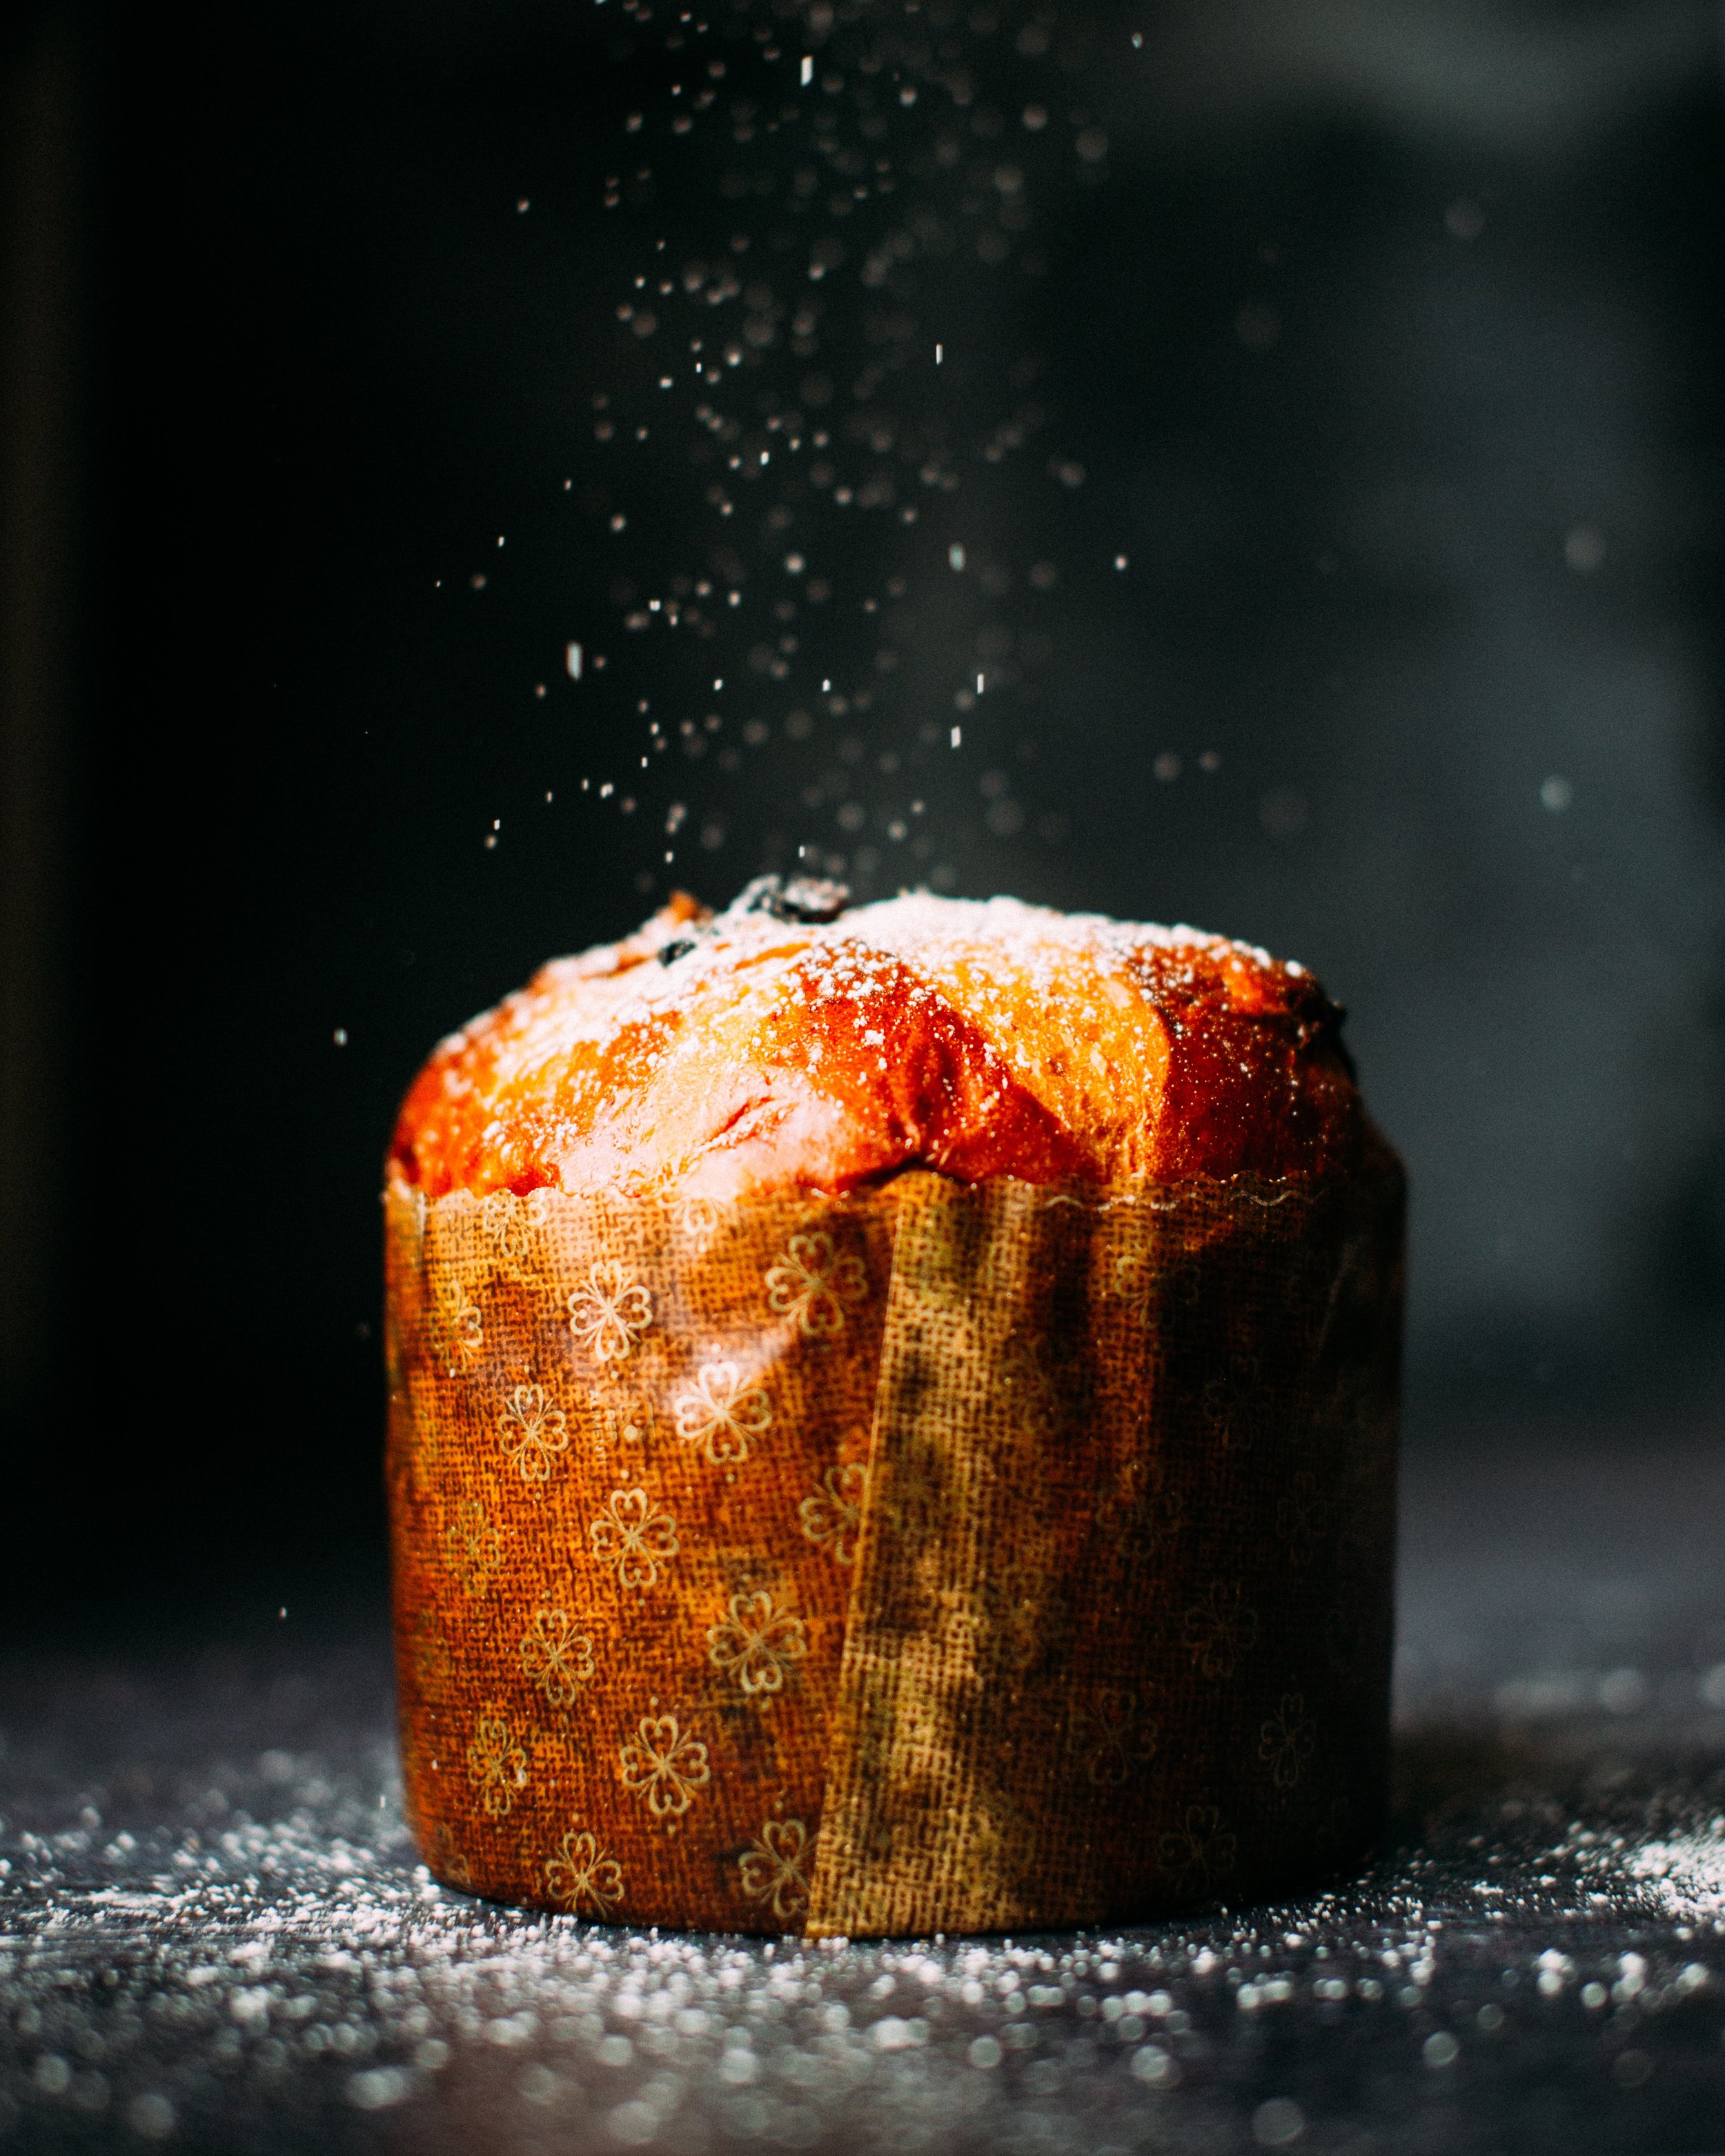 food-photographer-jennifer-pallian-173716-unsplash.jpg